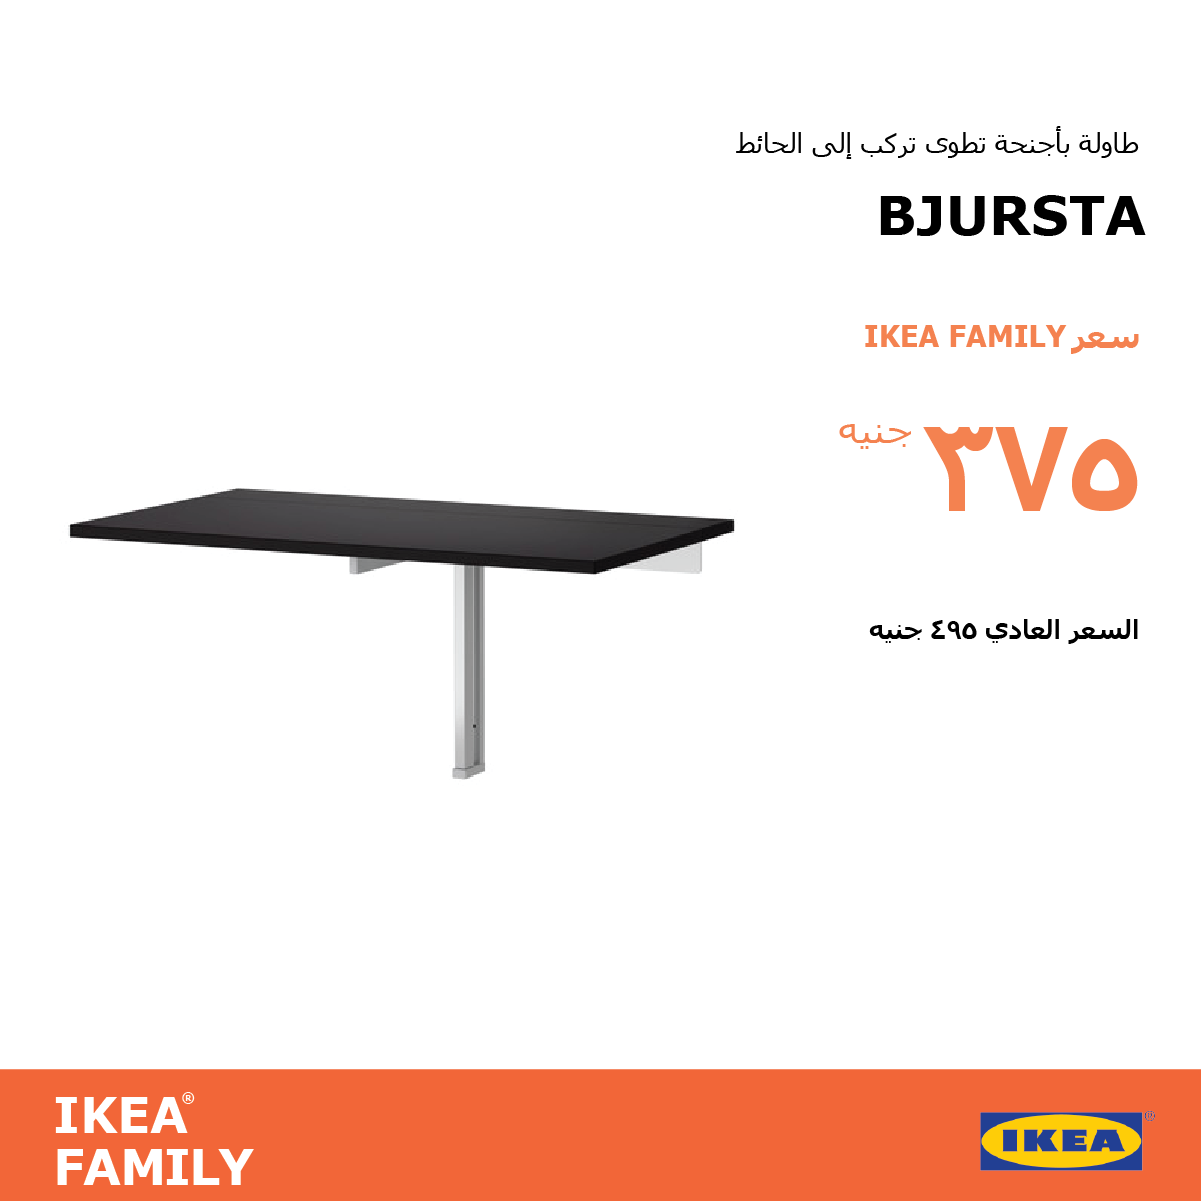 BJURSTA. Wall-mounted drop-leaf table